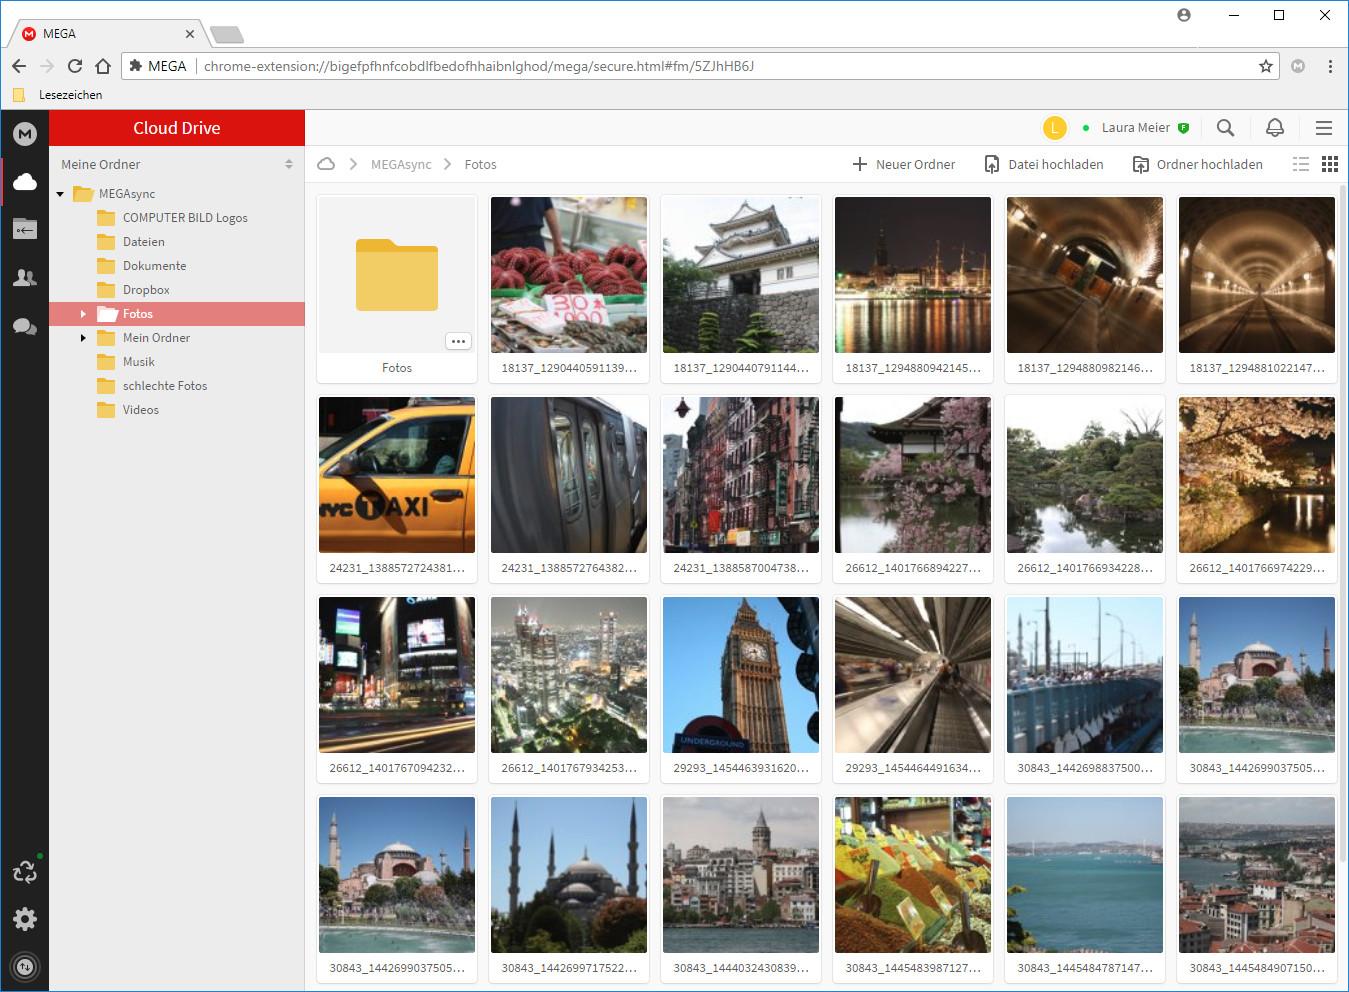 Screenshot 1 - Mega für Chrome